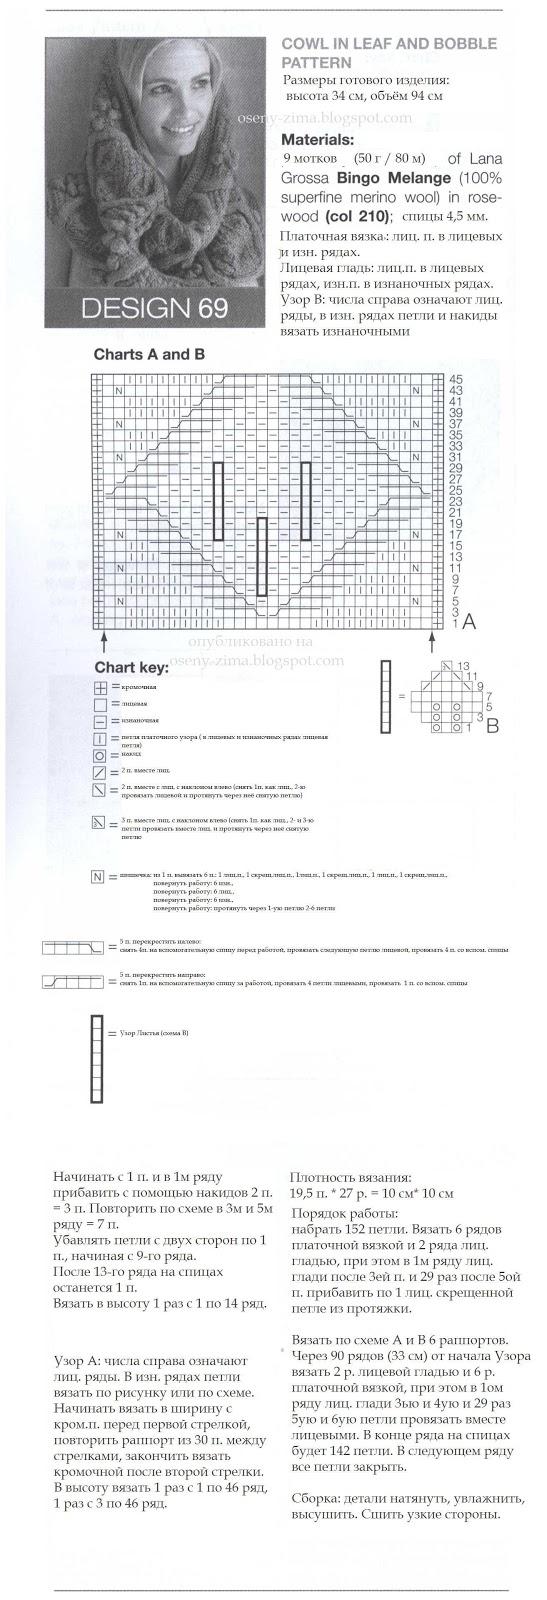 Вязание спицами шапка-труба фото и схема